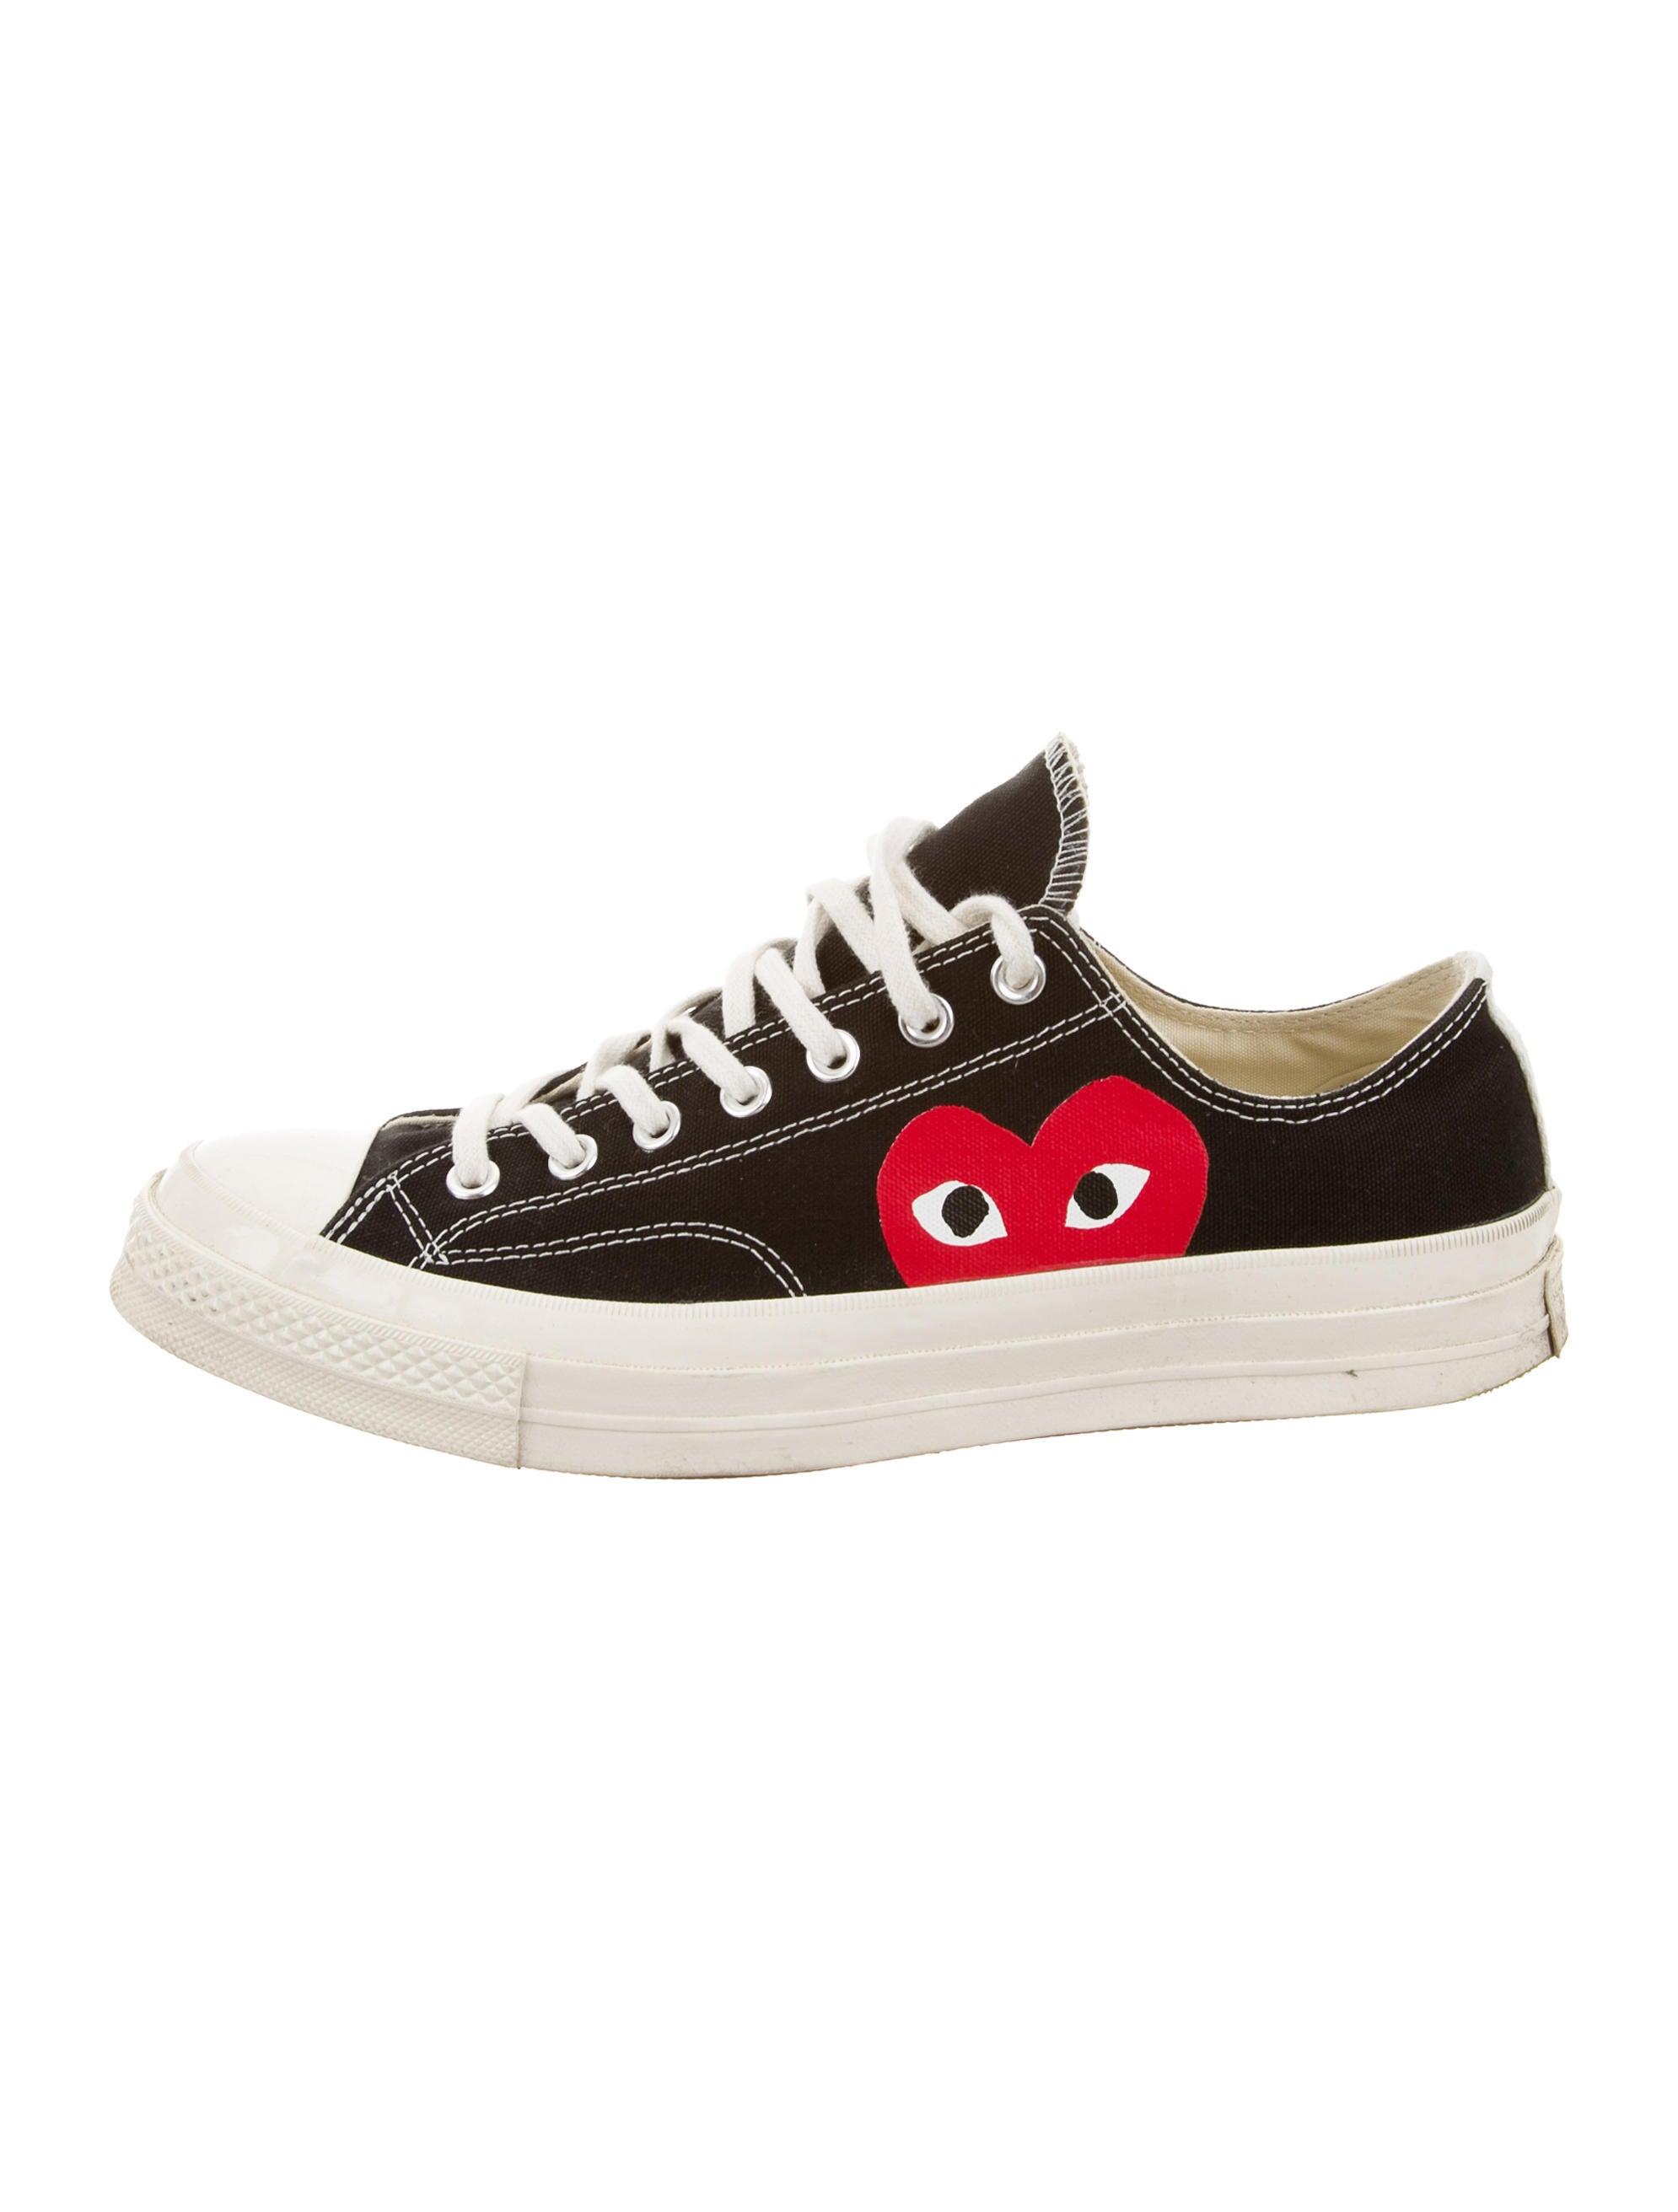 3aea9f80fb8b Comme des Garçons Play x Converse Canvas Low-Top Sneakers - Shoes ...